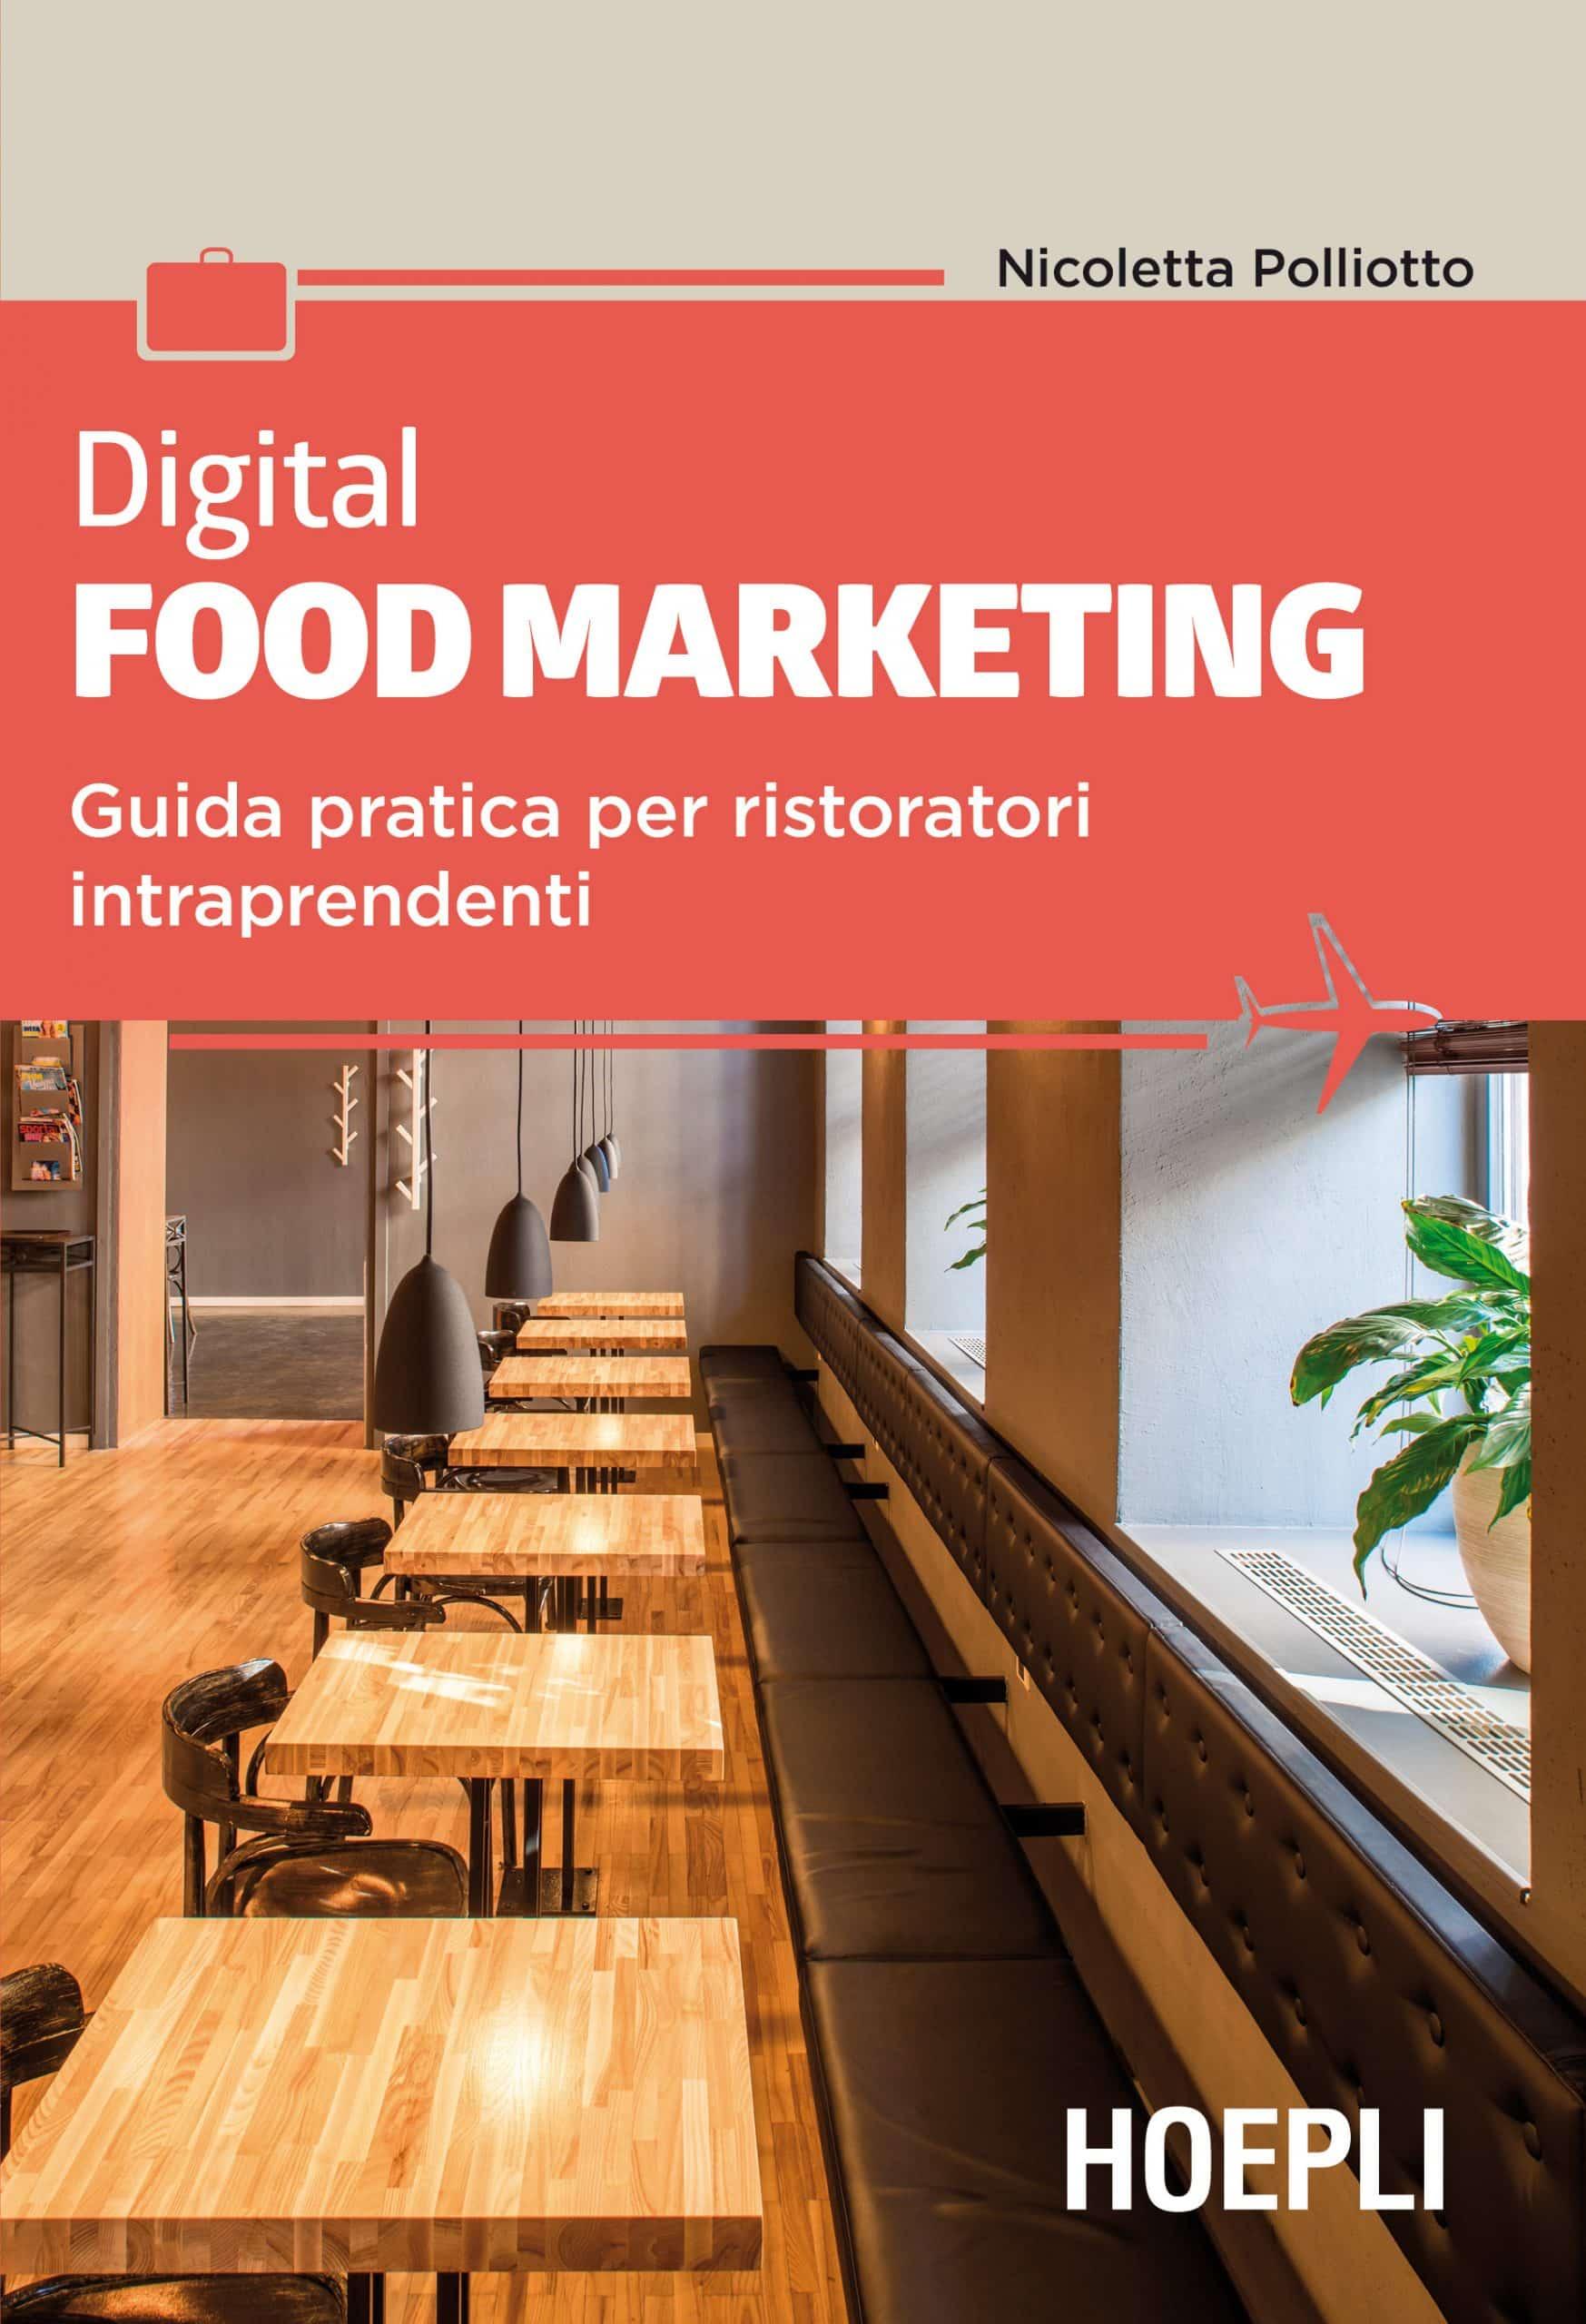 digital-food-marketing-coverpolliotto-1